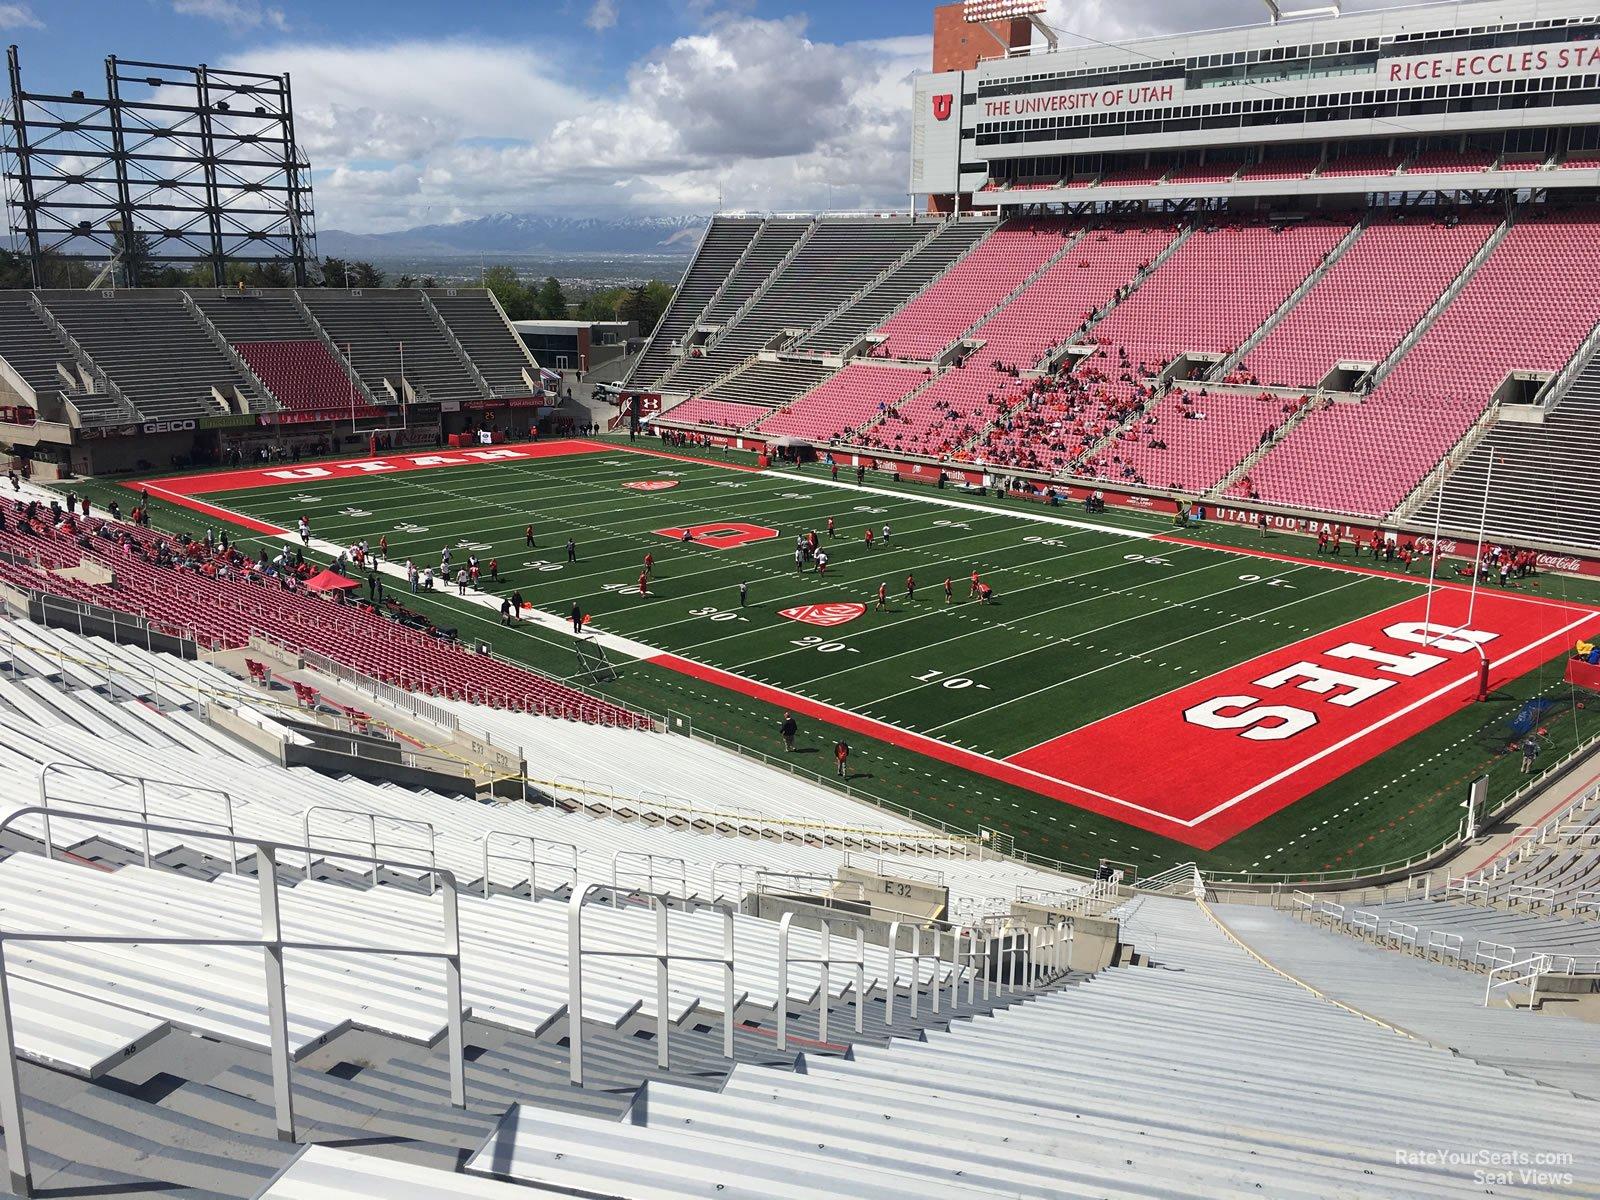 Section E30 seat view